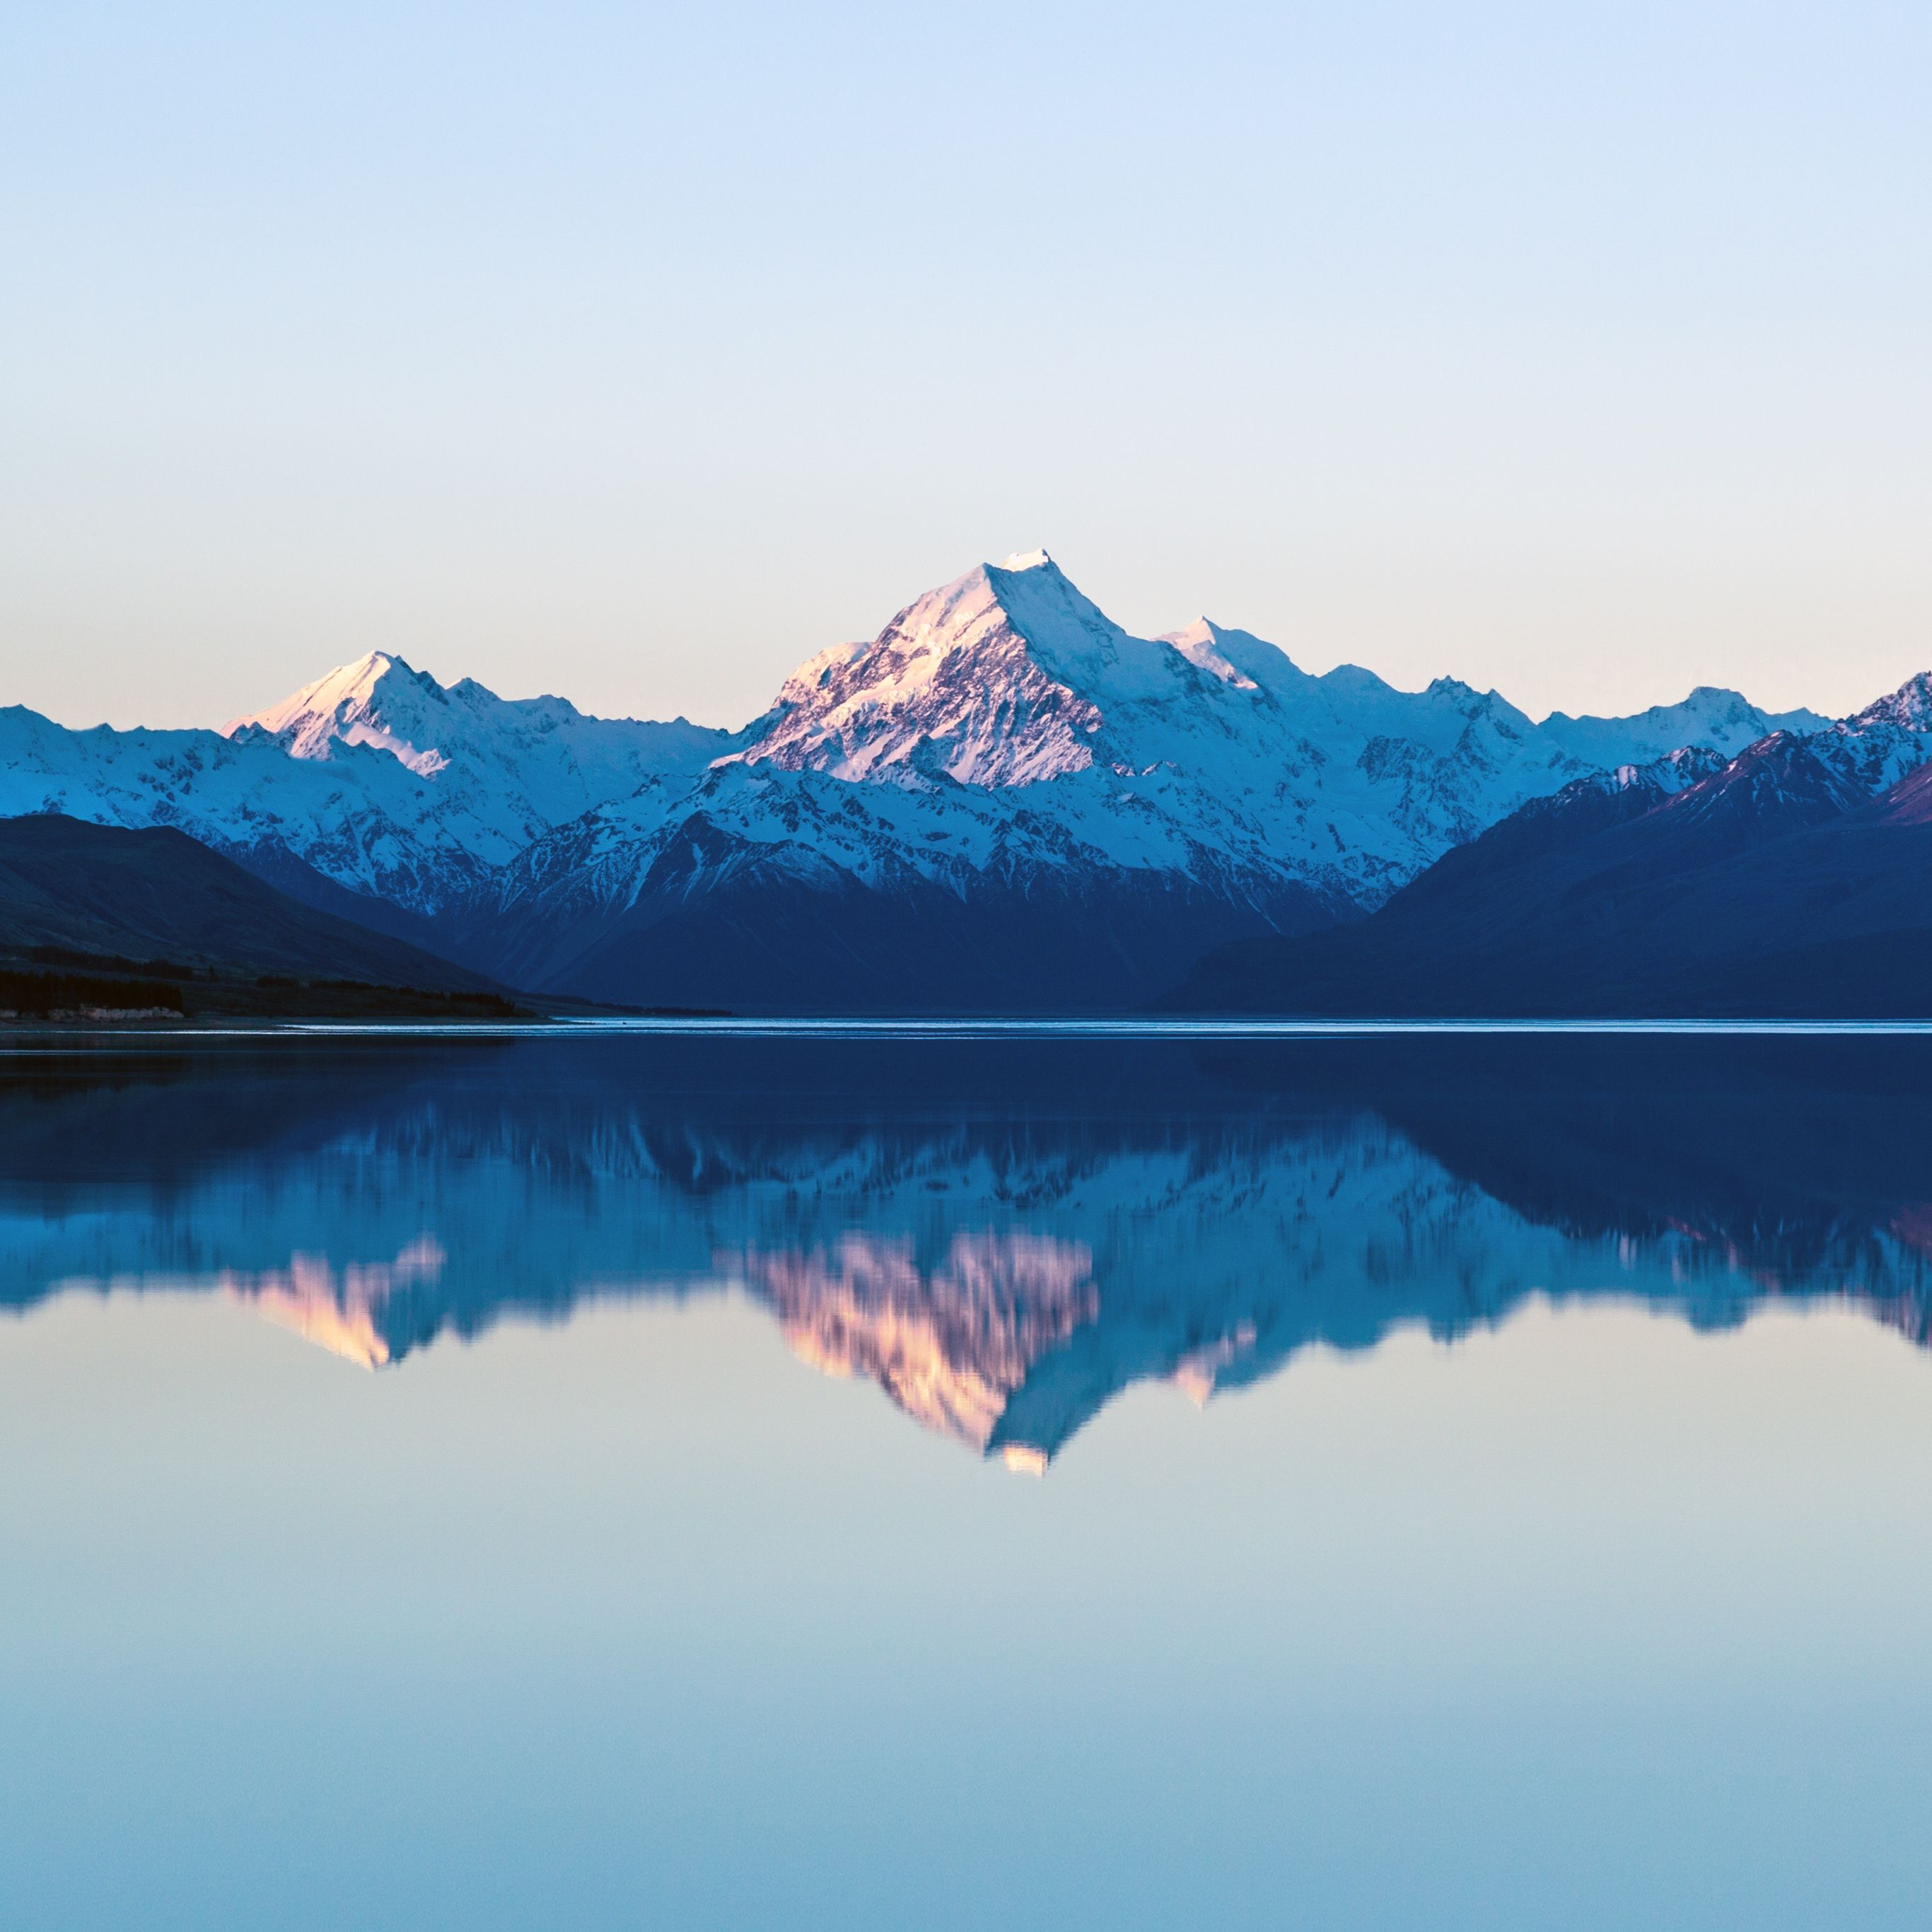 iPad Pro Reflection on the Lake Wallpaper Fondos de